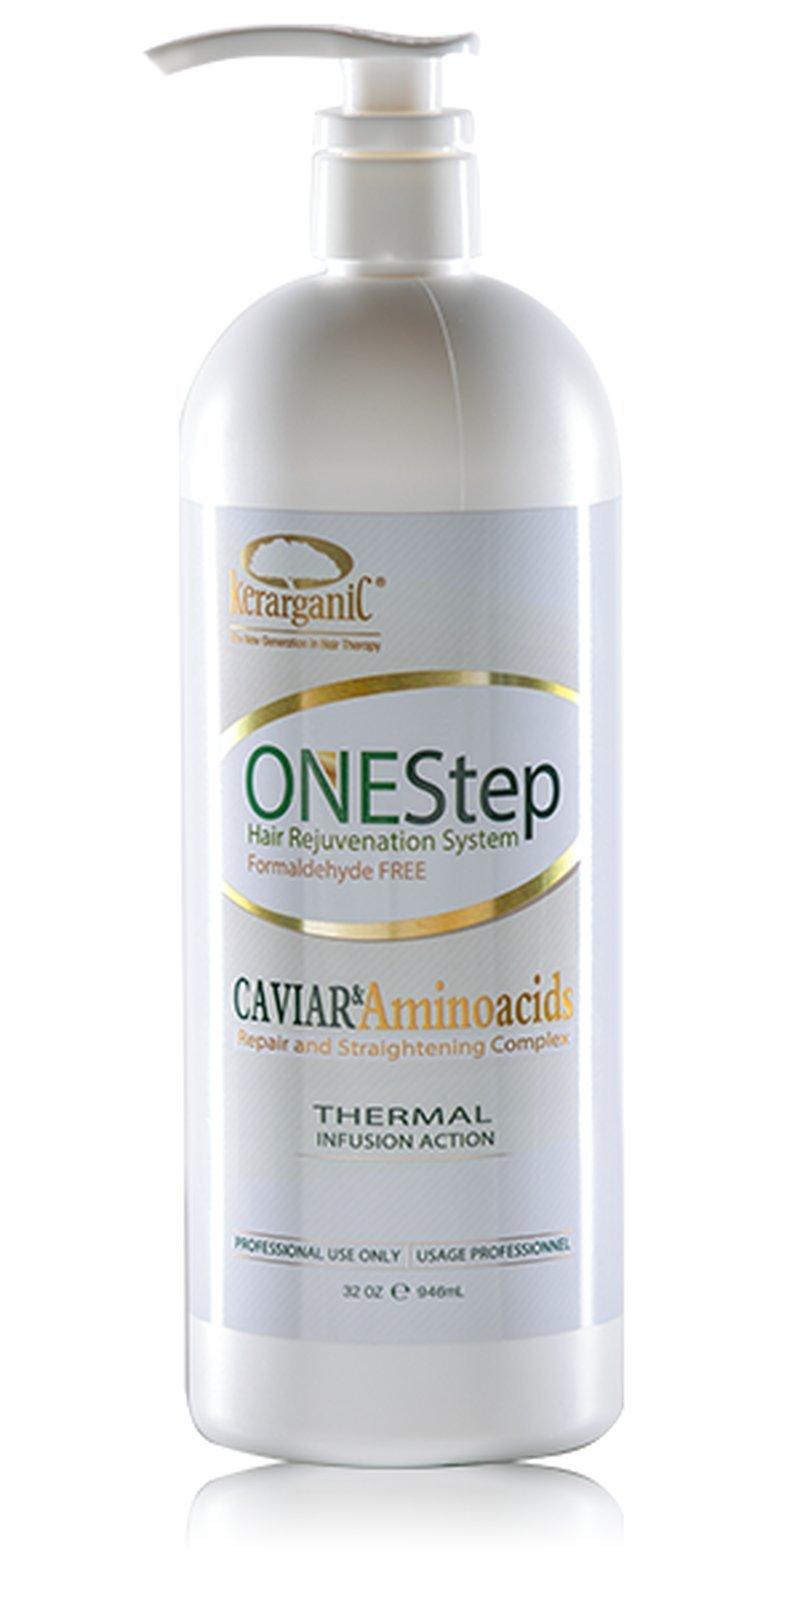 Kerarganic One Step Hair Rejuvination System Formaldehyde Free 32oz